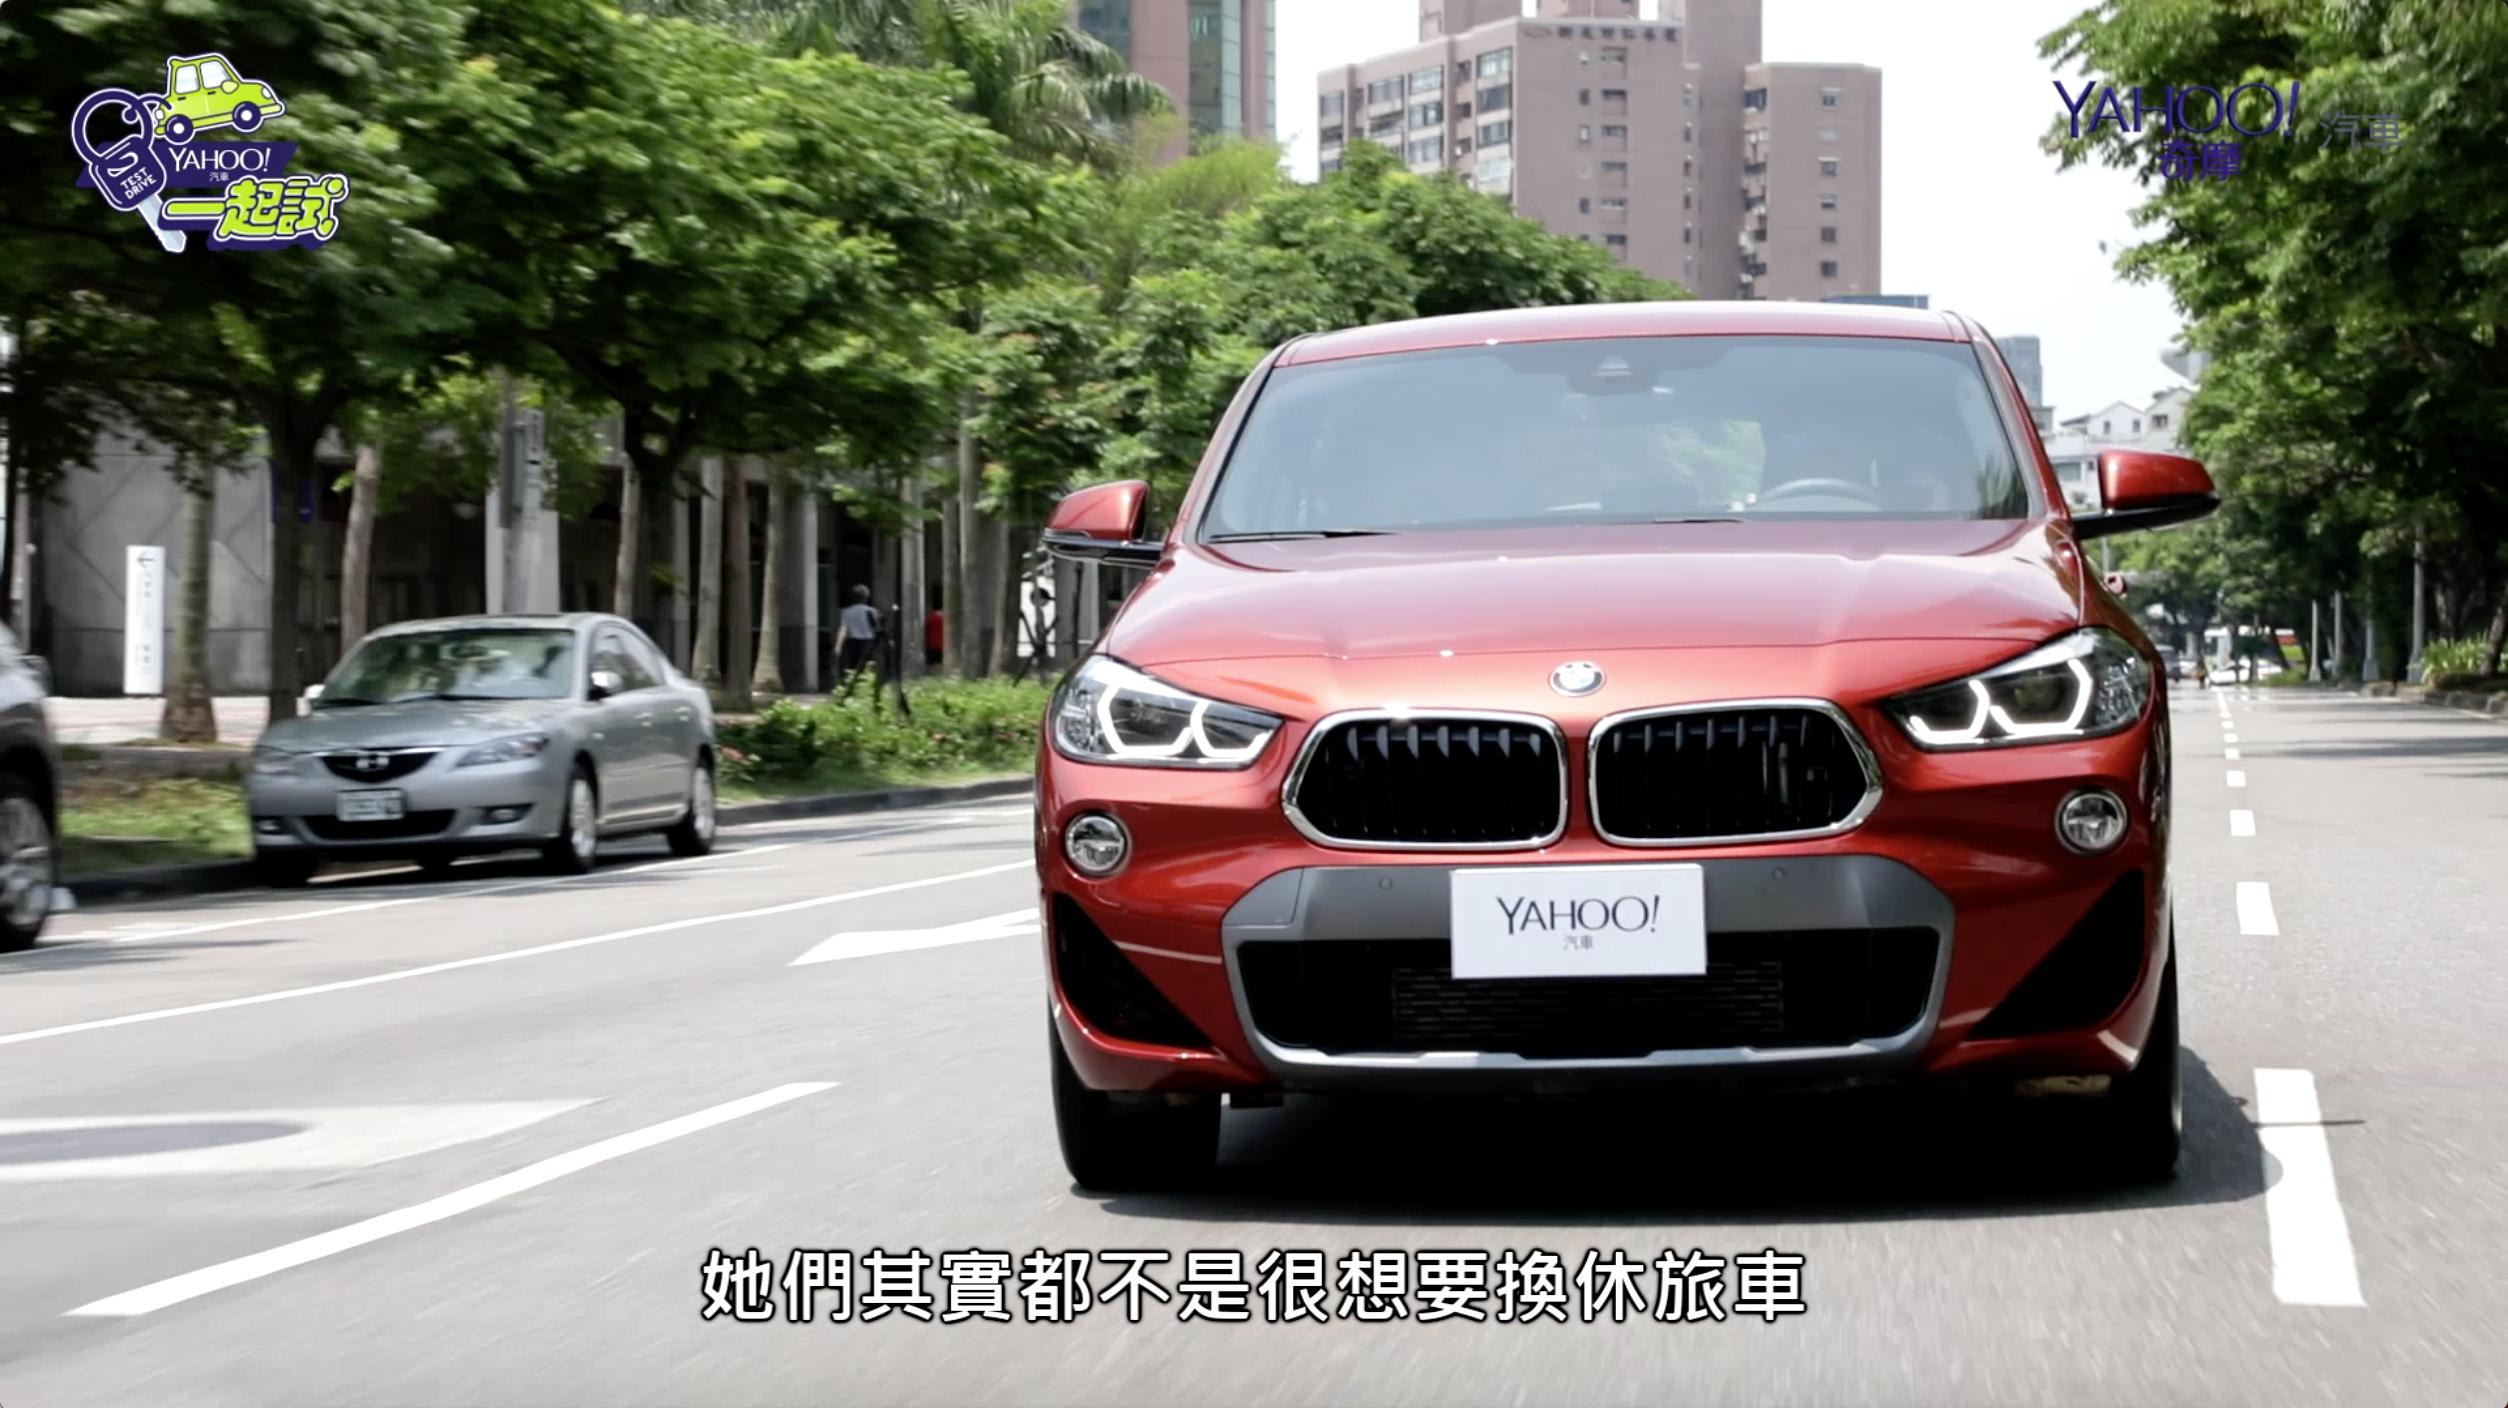 【Yahoo汽車一起試】Vol.6 打破你對前置前驅動力印象的 BMW X2